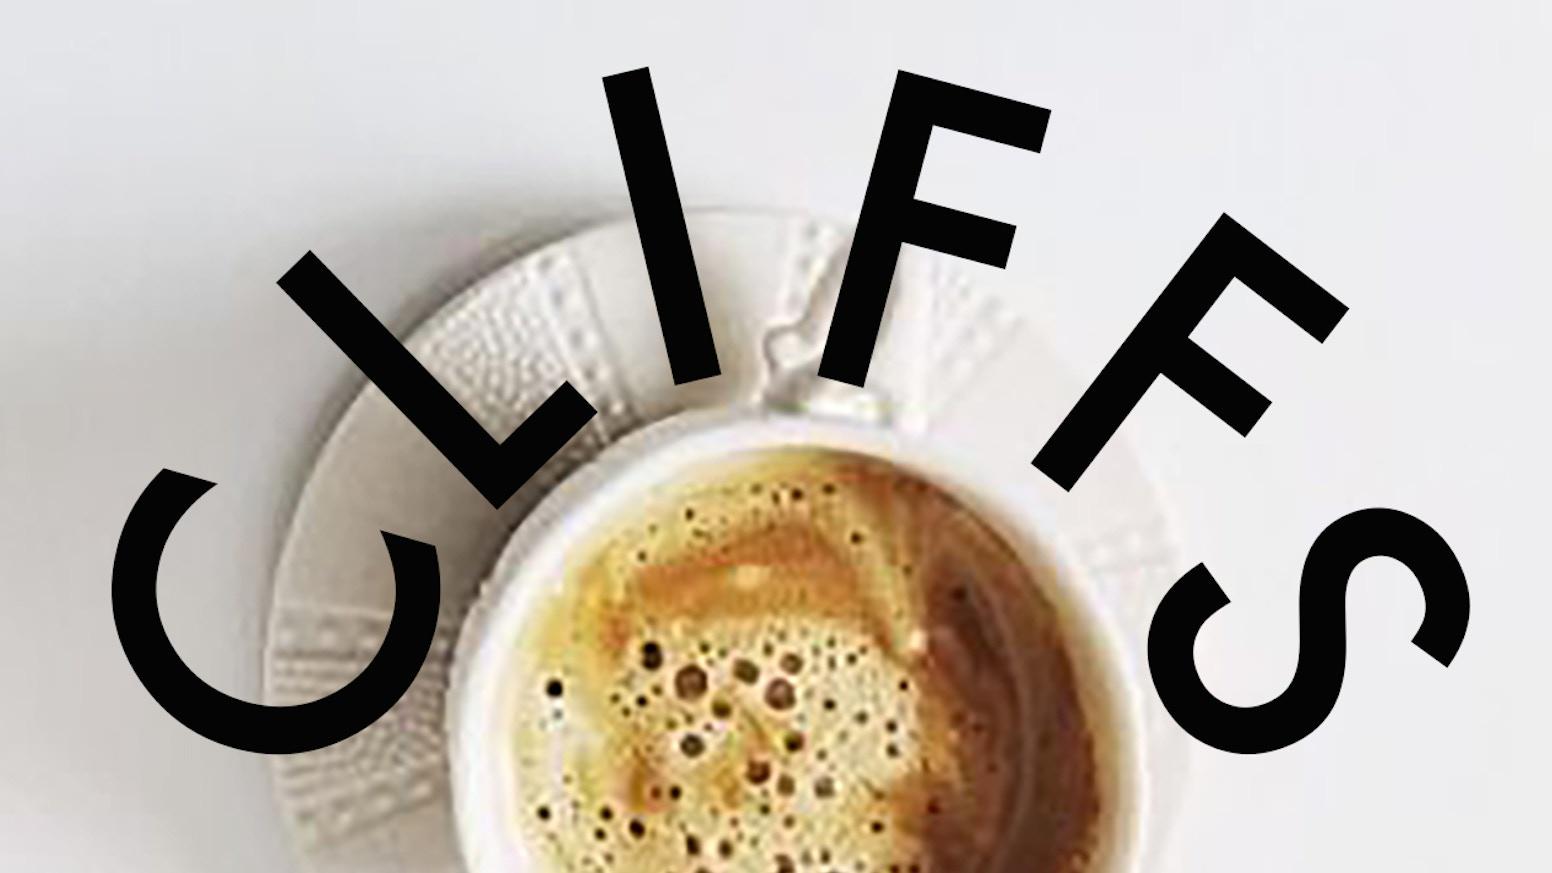 Cliffs Margate Coffee Records Yoga Hair By Kier Muddiman Ed Warren Kickstarter